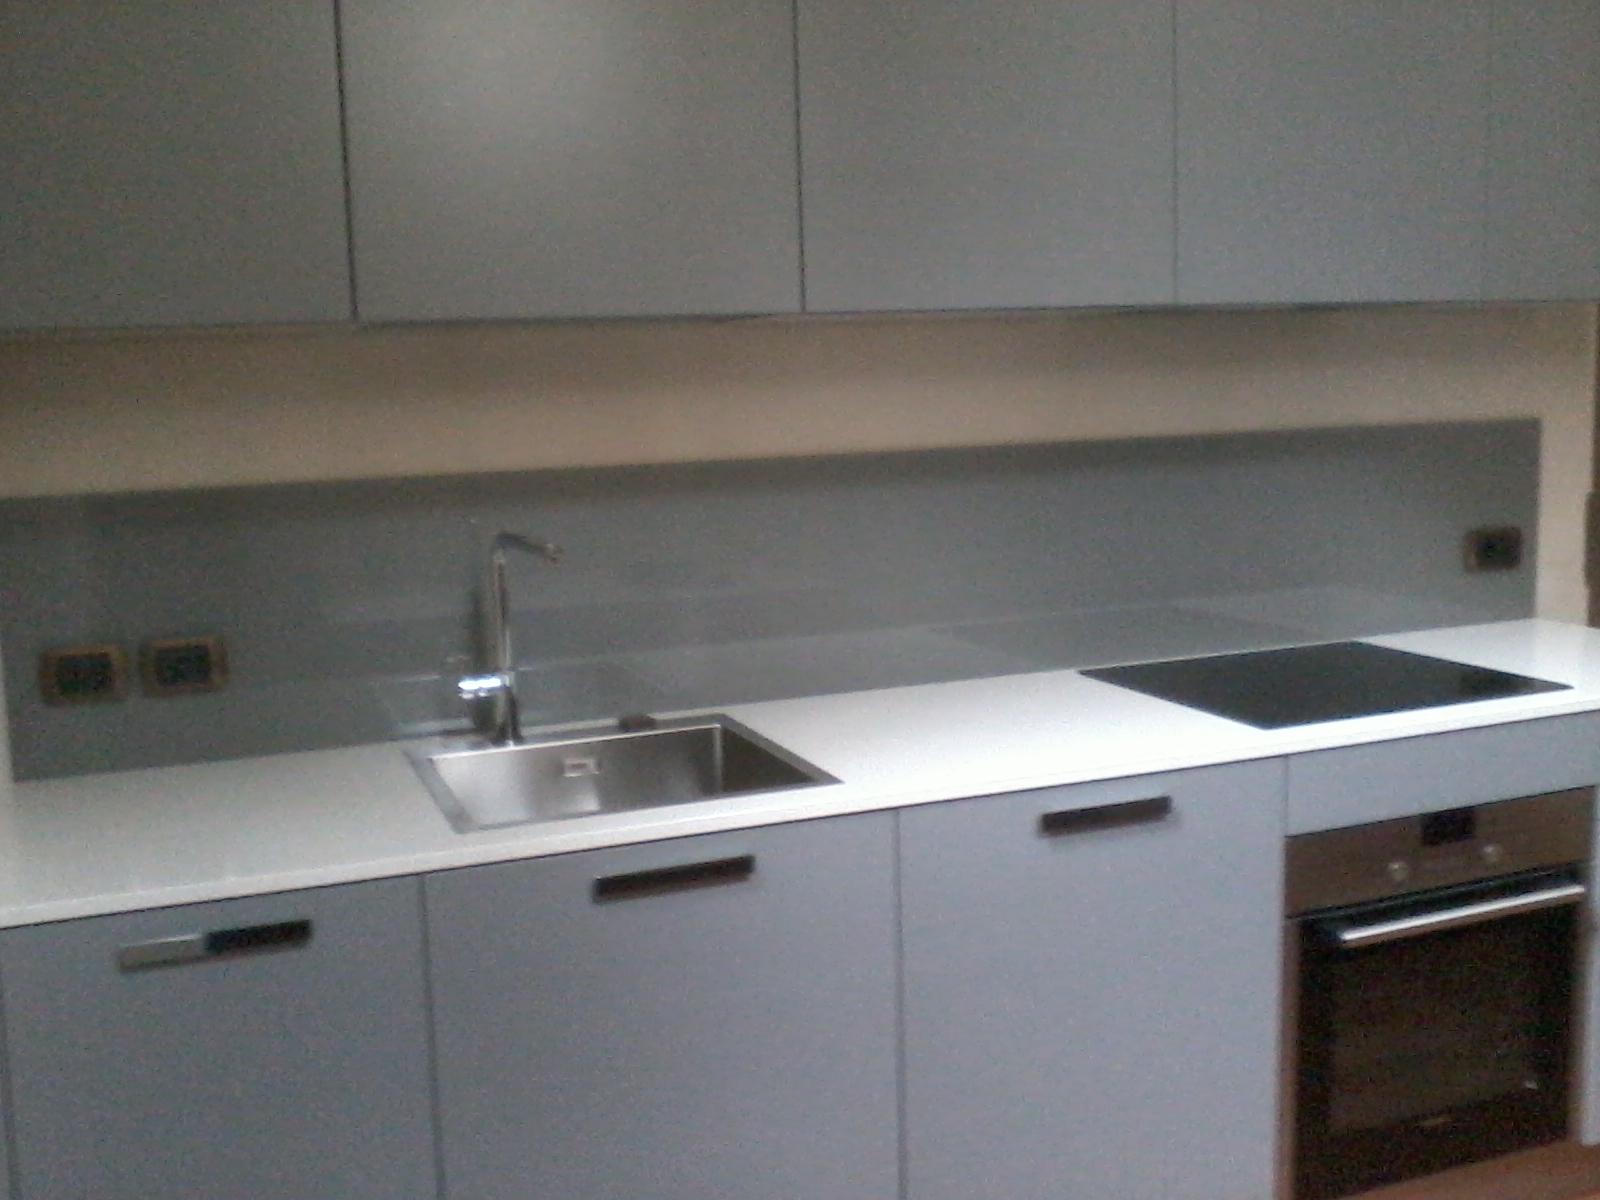 Schienale cucina in vetro fabulous cucina laccato opaco - Schienale cucina in vetro temperato ...